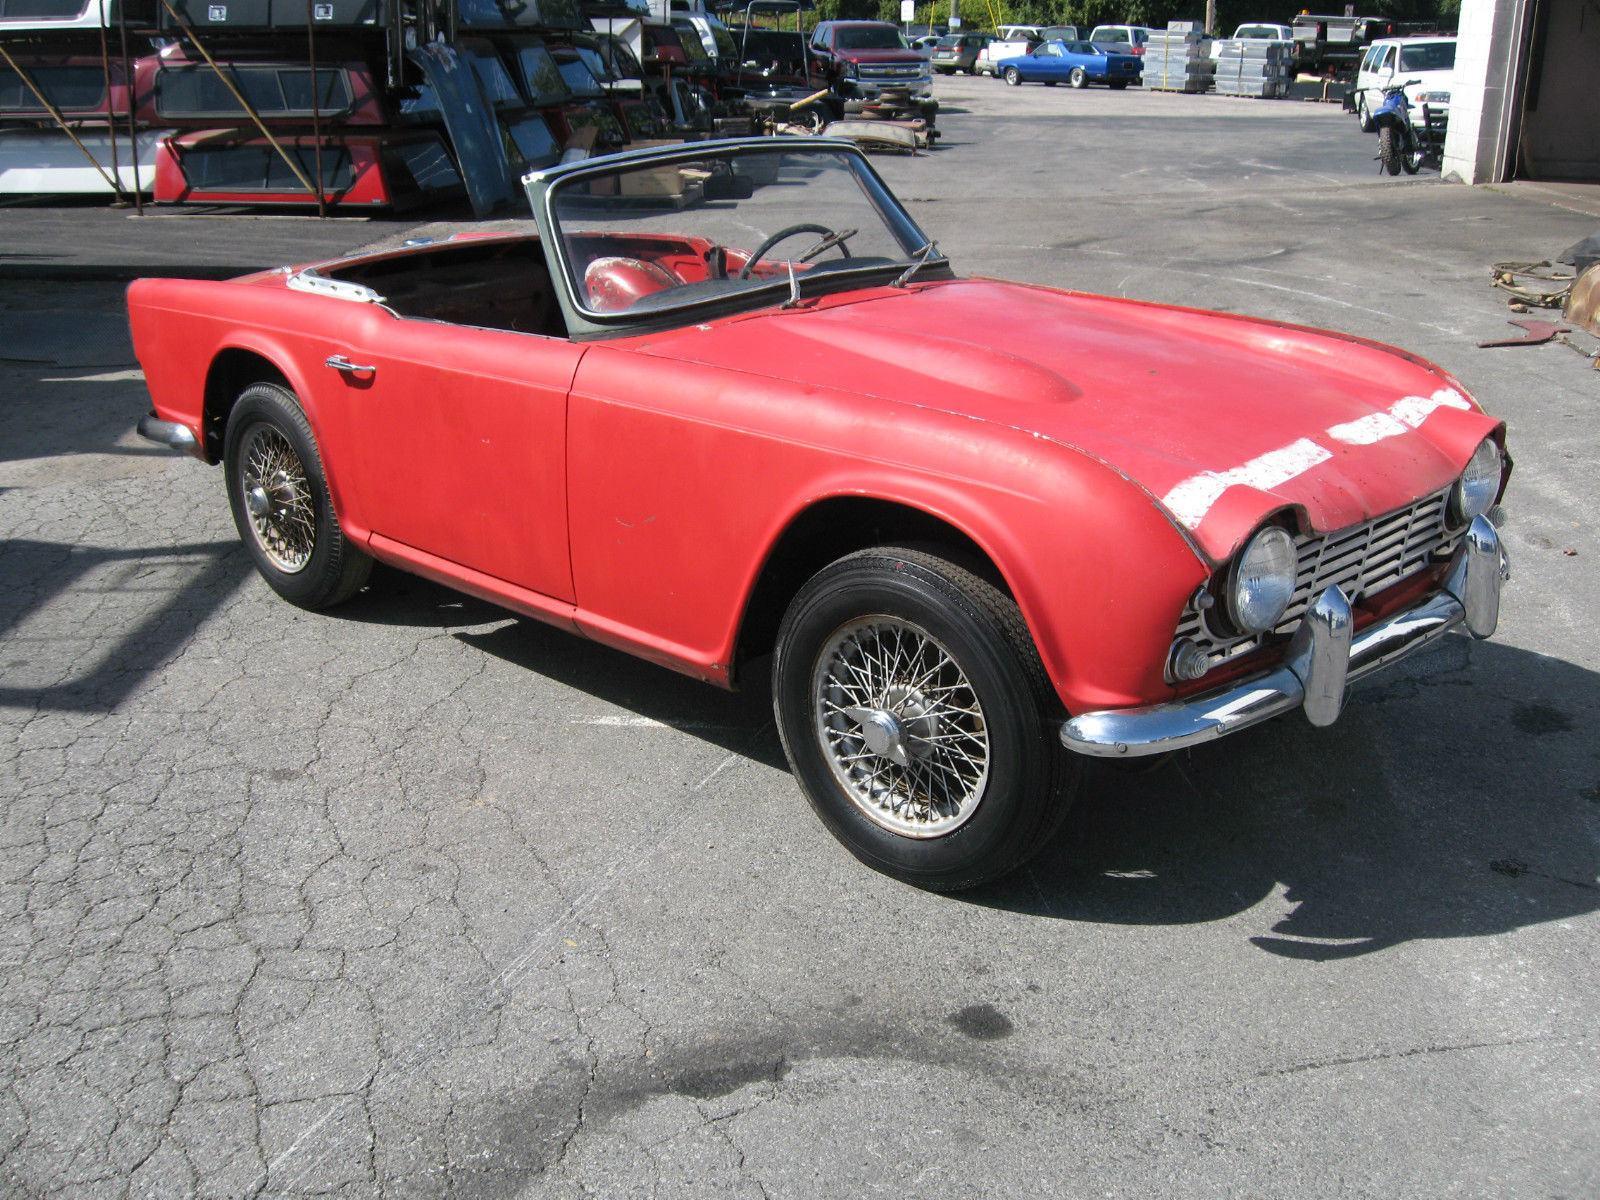 1961 triumph tr4 project car for sale for Triumph motor cars for sale